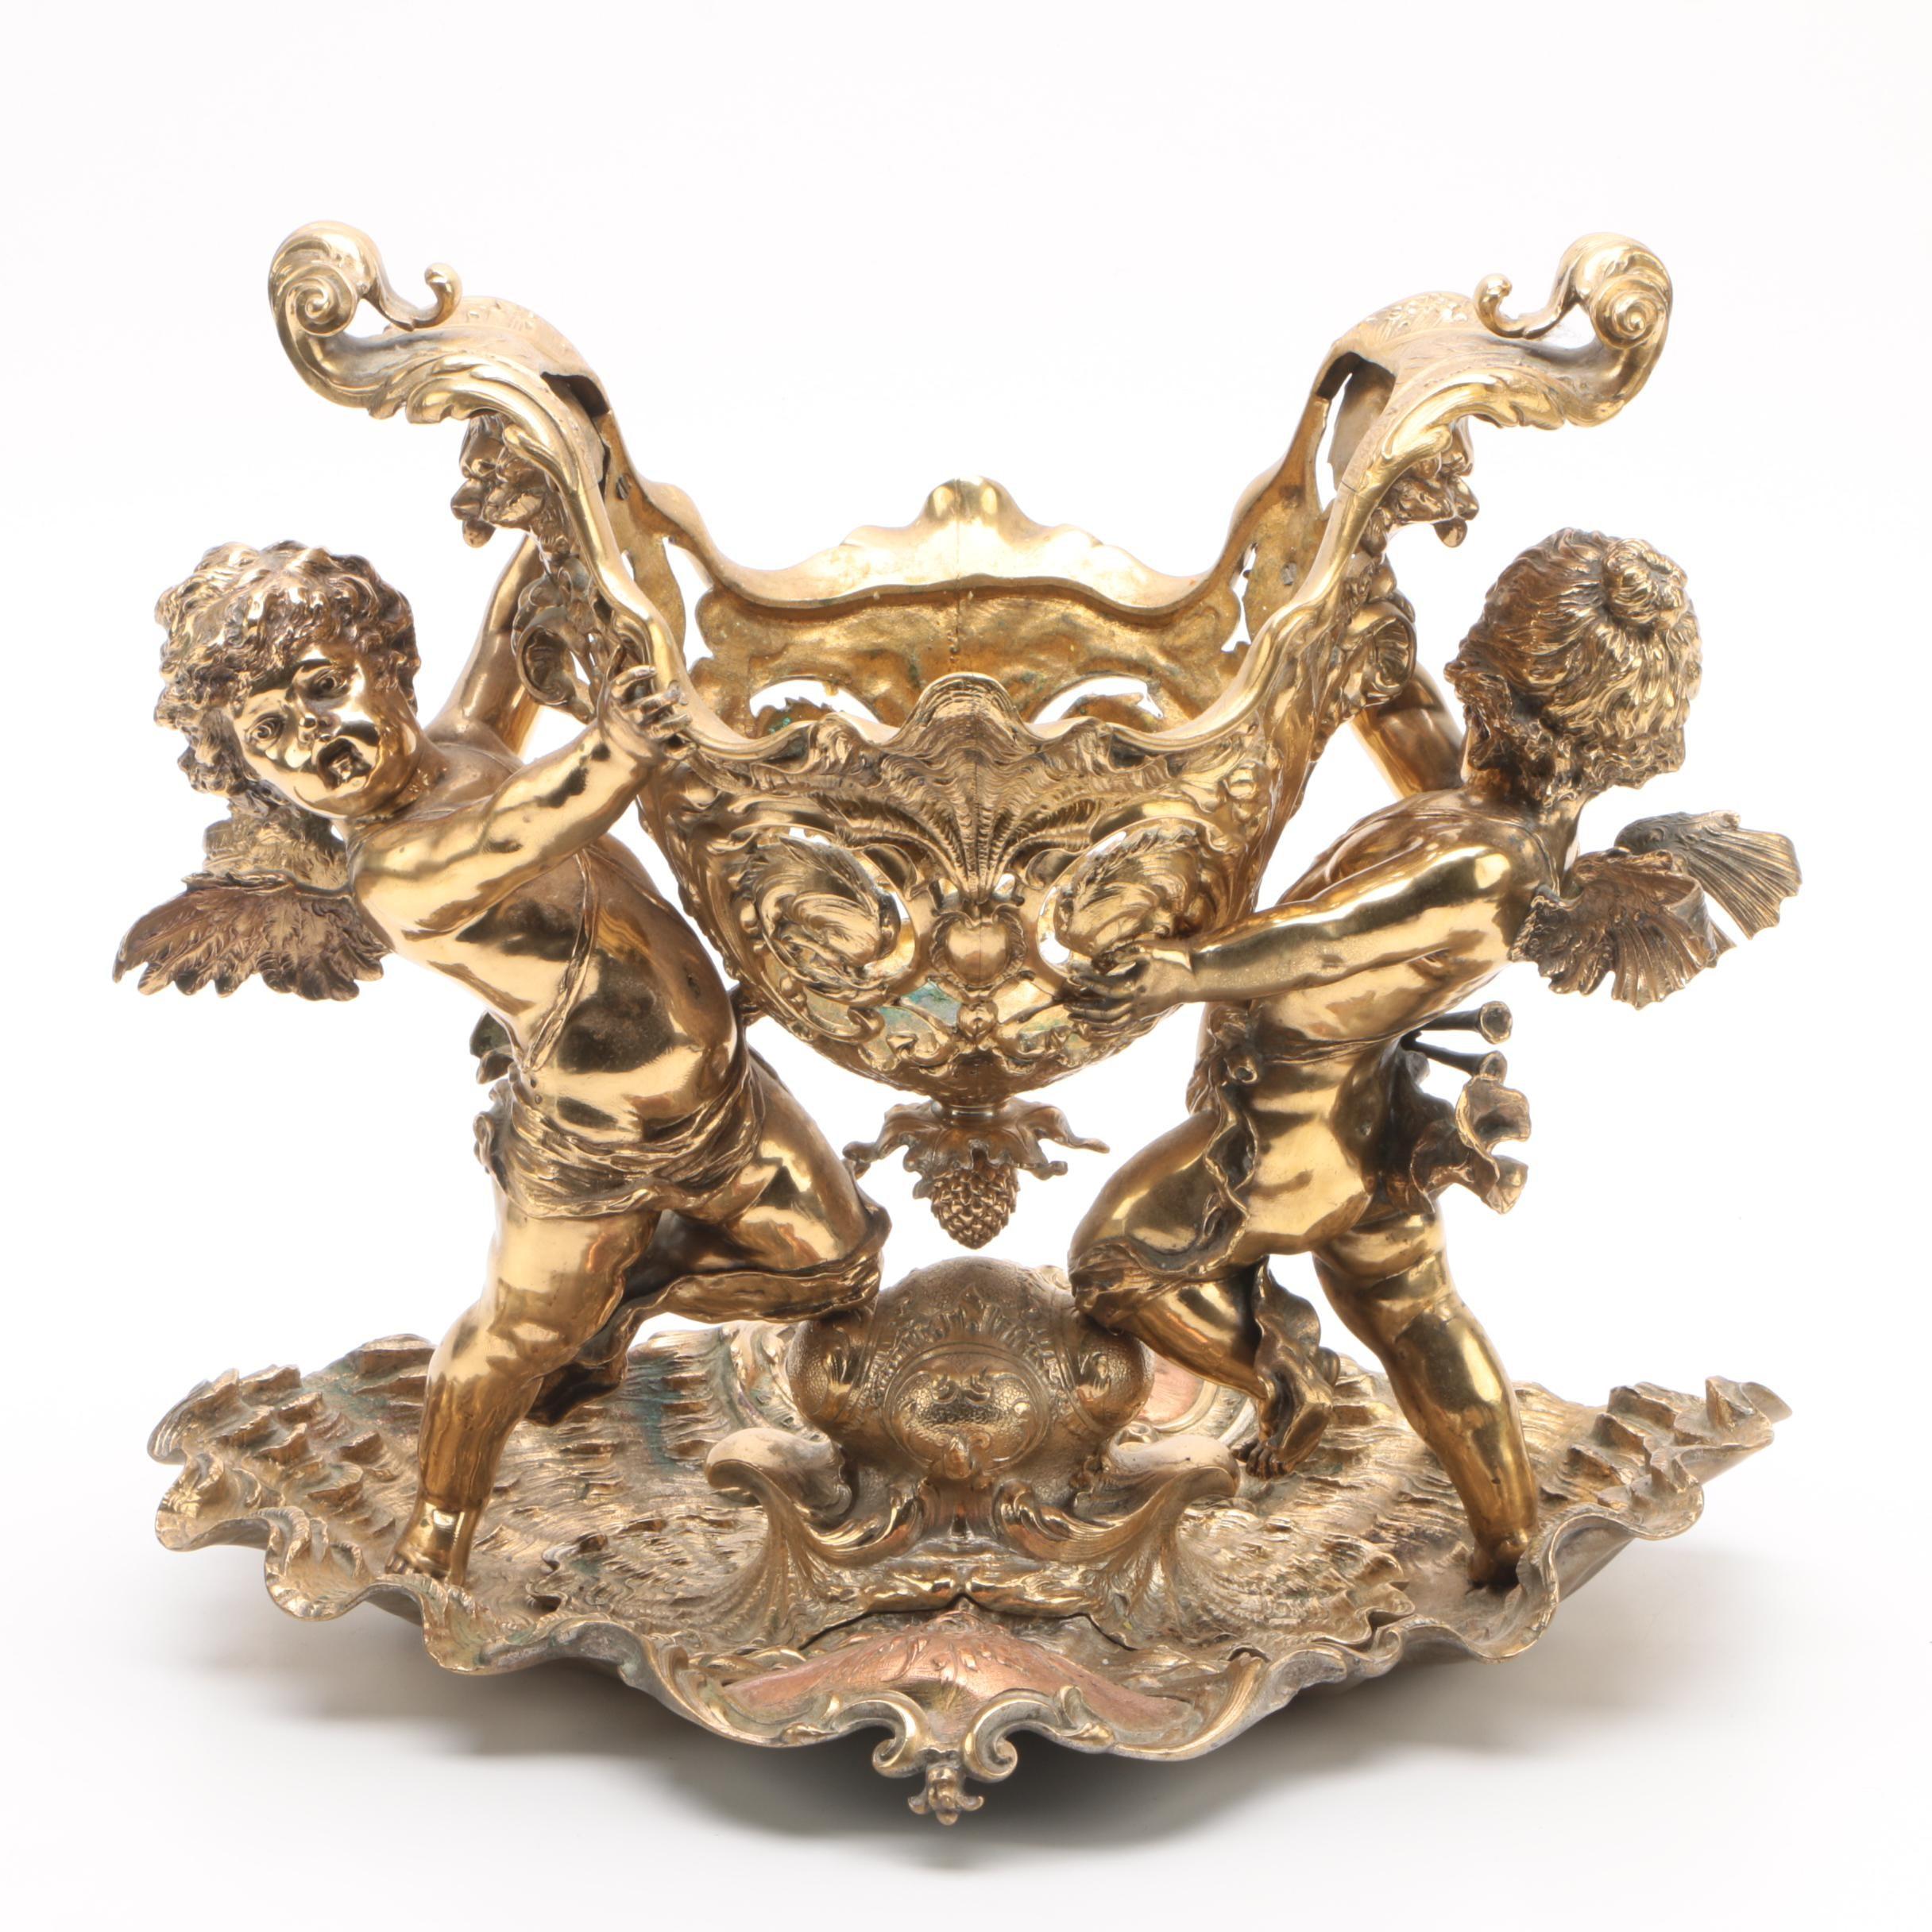 Rococo Style Brass Cherub and Shell Centerpiece